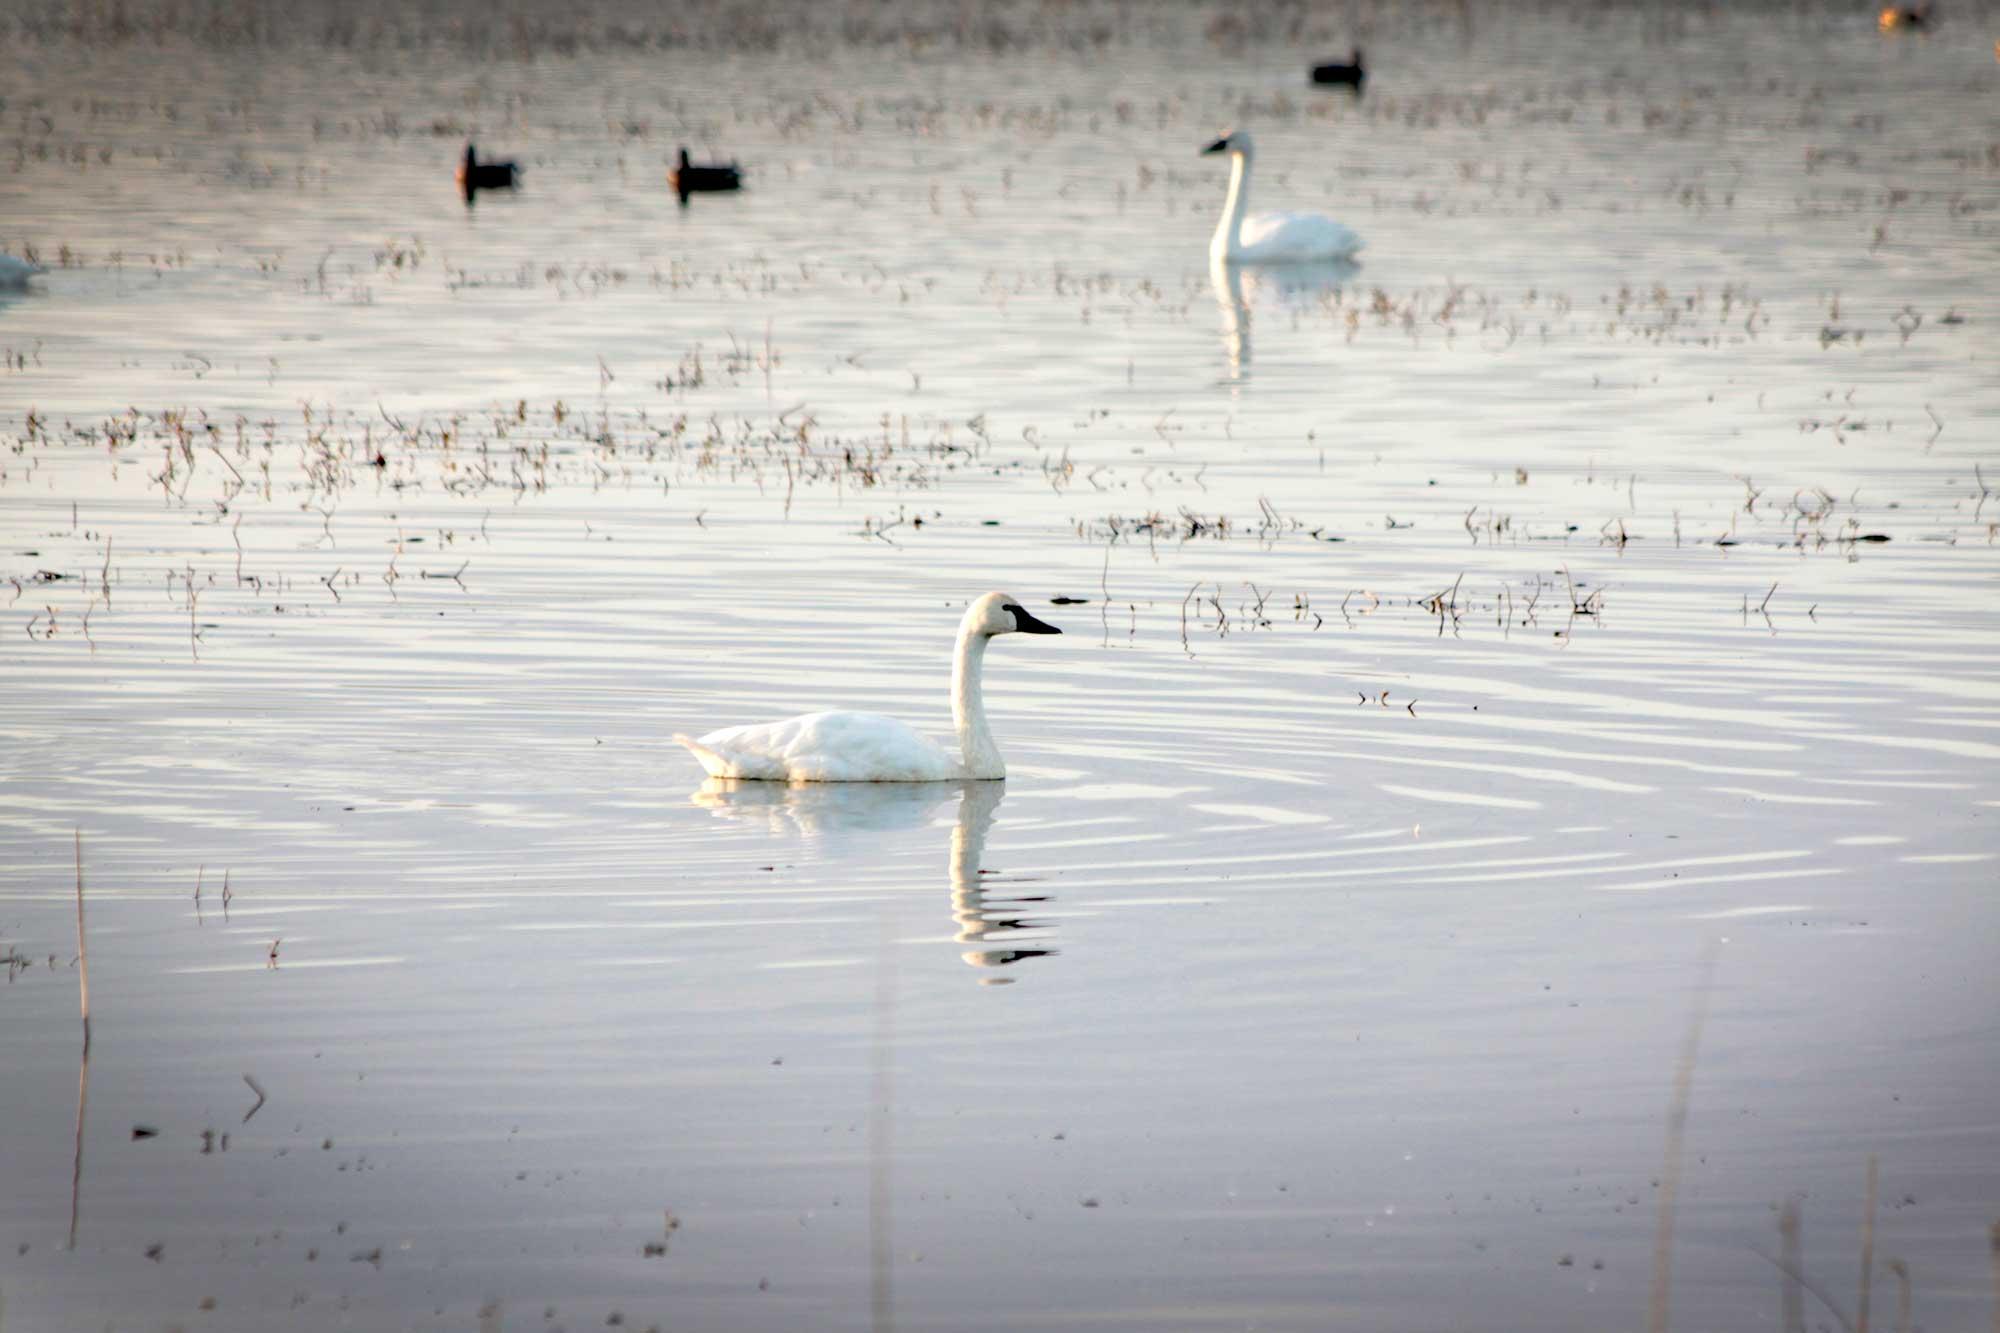 Tundra swans at Mattamuskeet National Wildlife Refuge, North Carolina